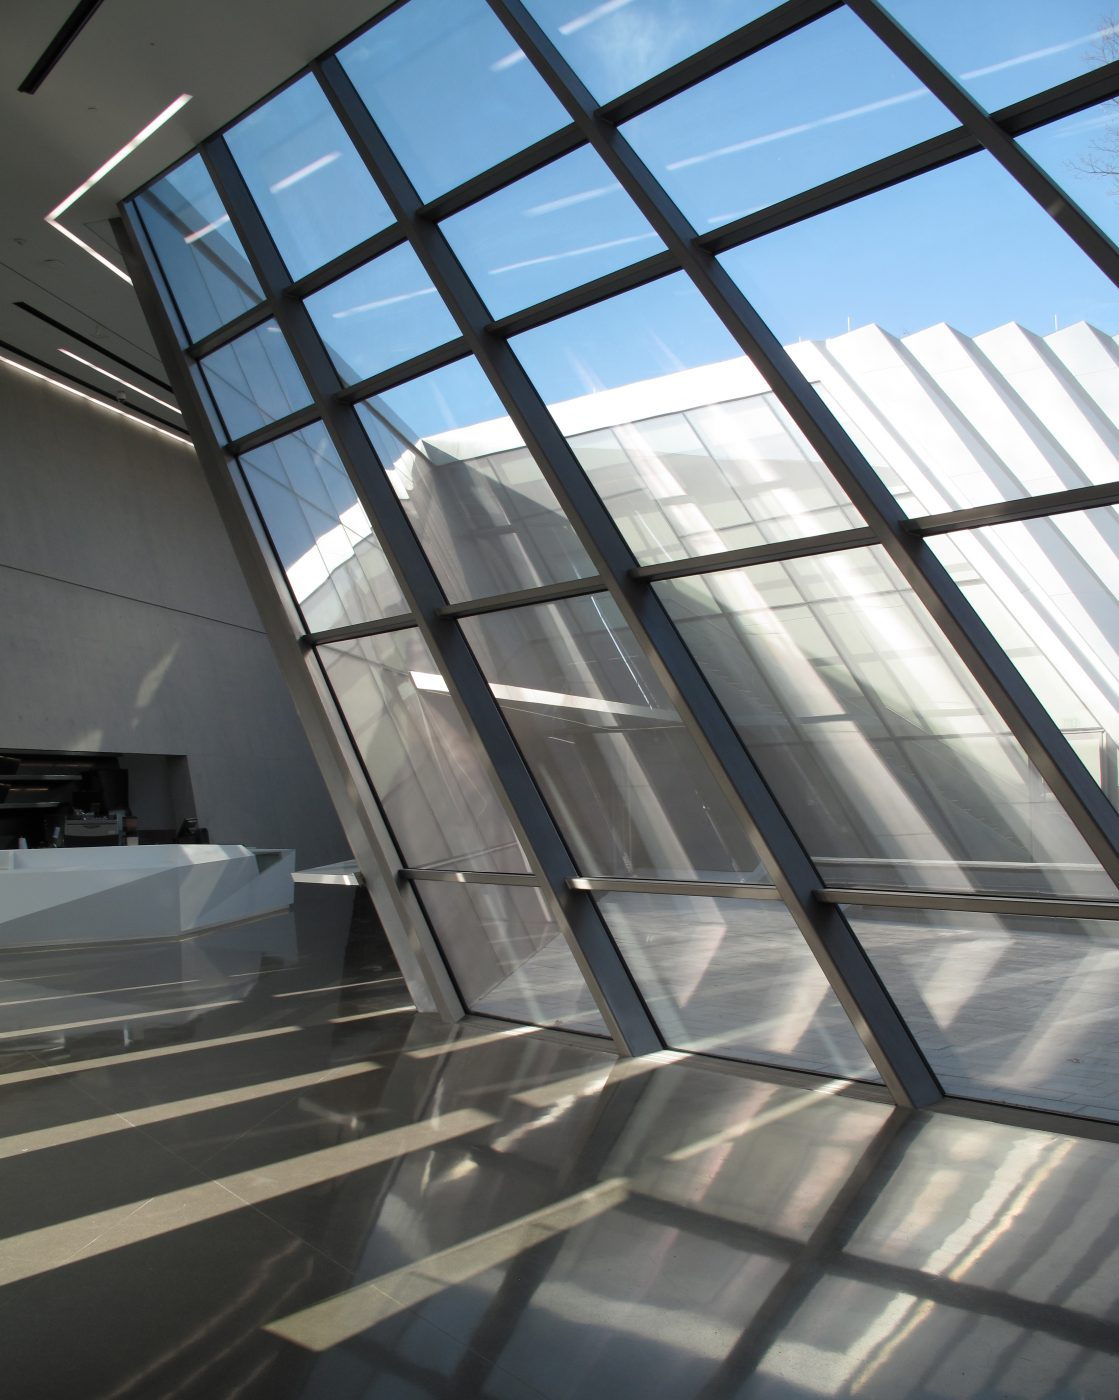 Eli & Edythe Broad Museum- ZHA- East Lansing, MI-photo by Paul Clemence